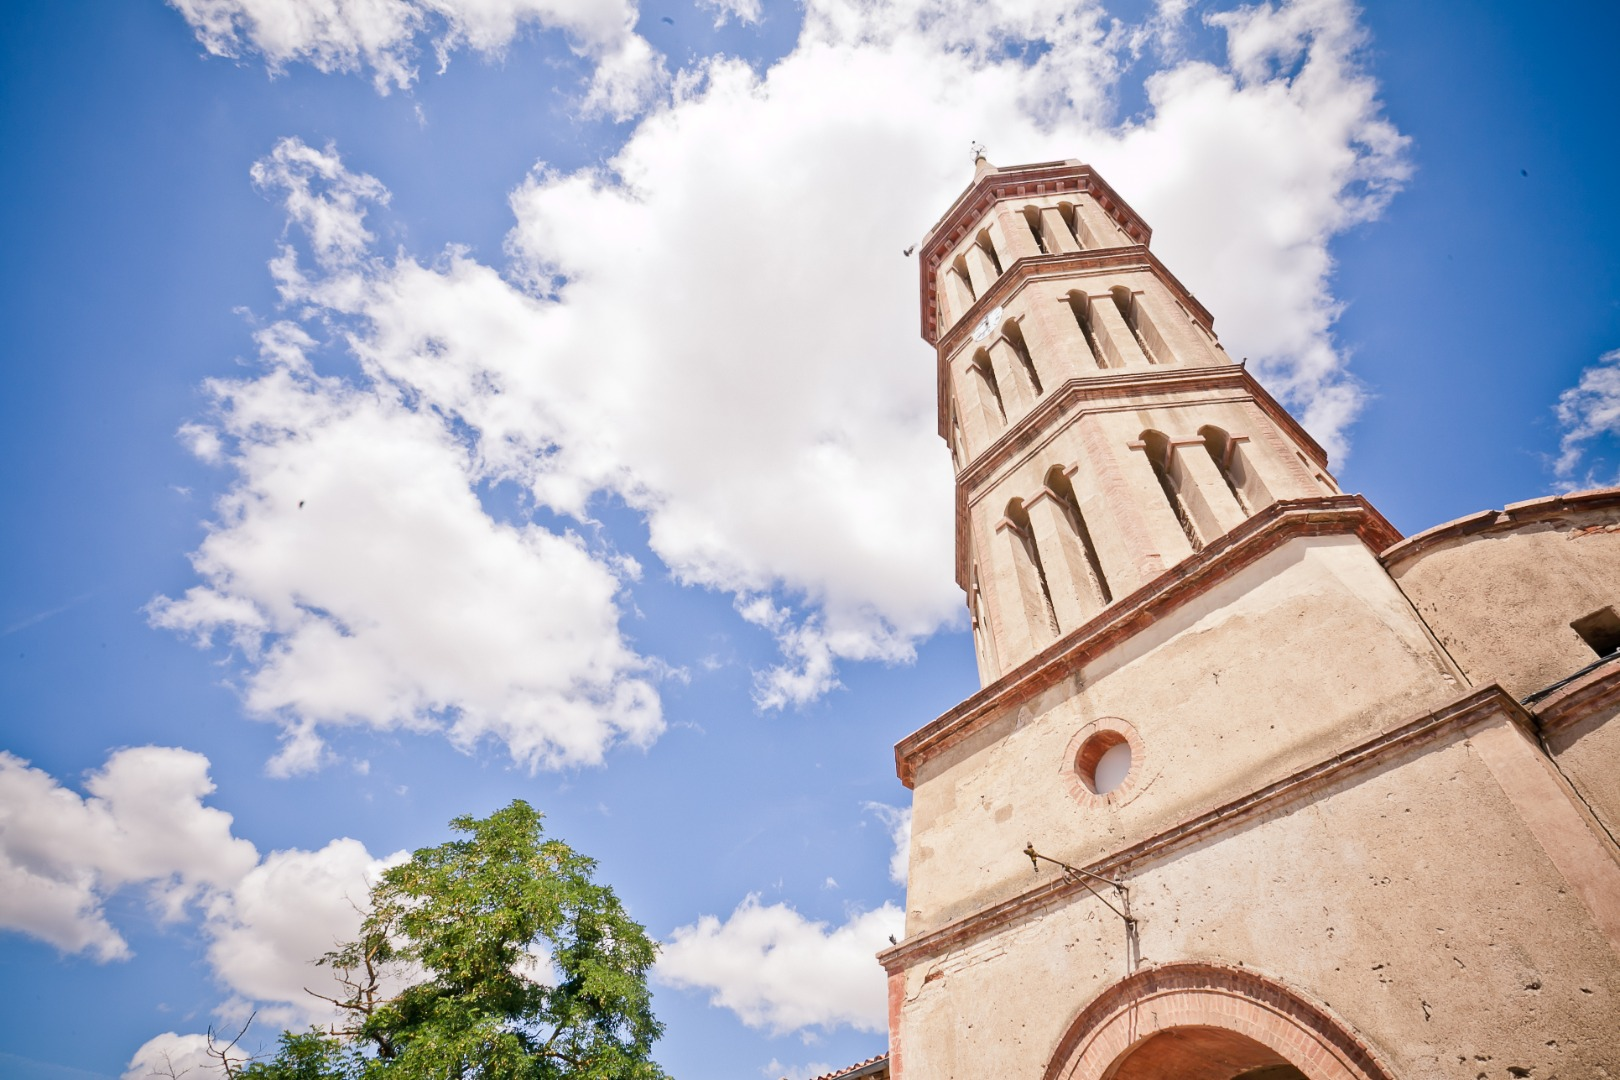 Eglise majestueuse La Dolce Vita Organisation de Mariages Toulouse.jpg